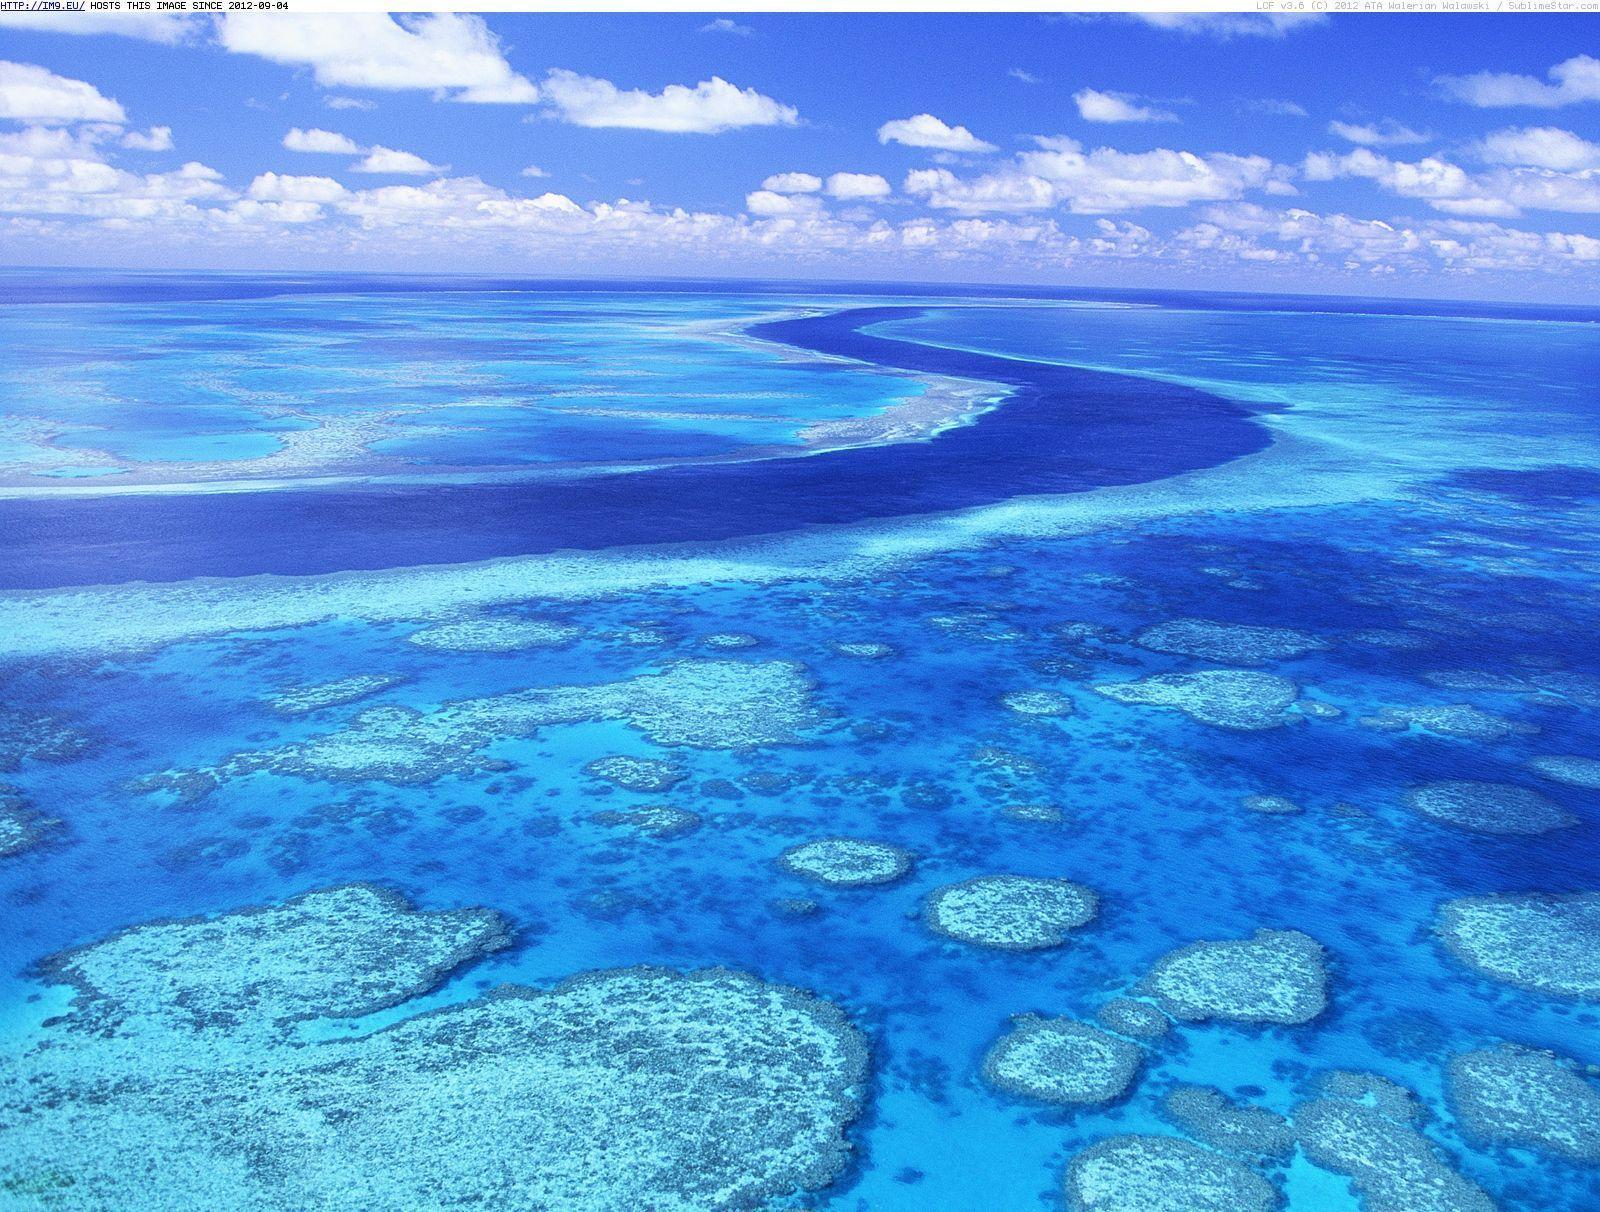 Reef Wallpaper Hd Wallpapers